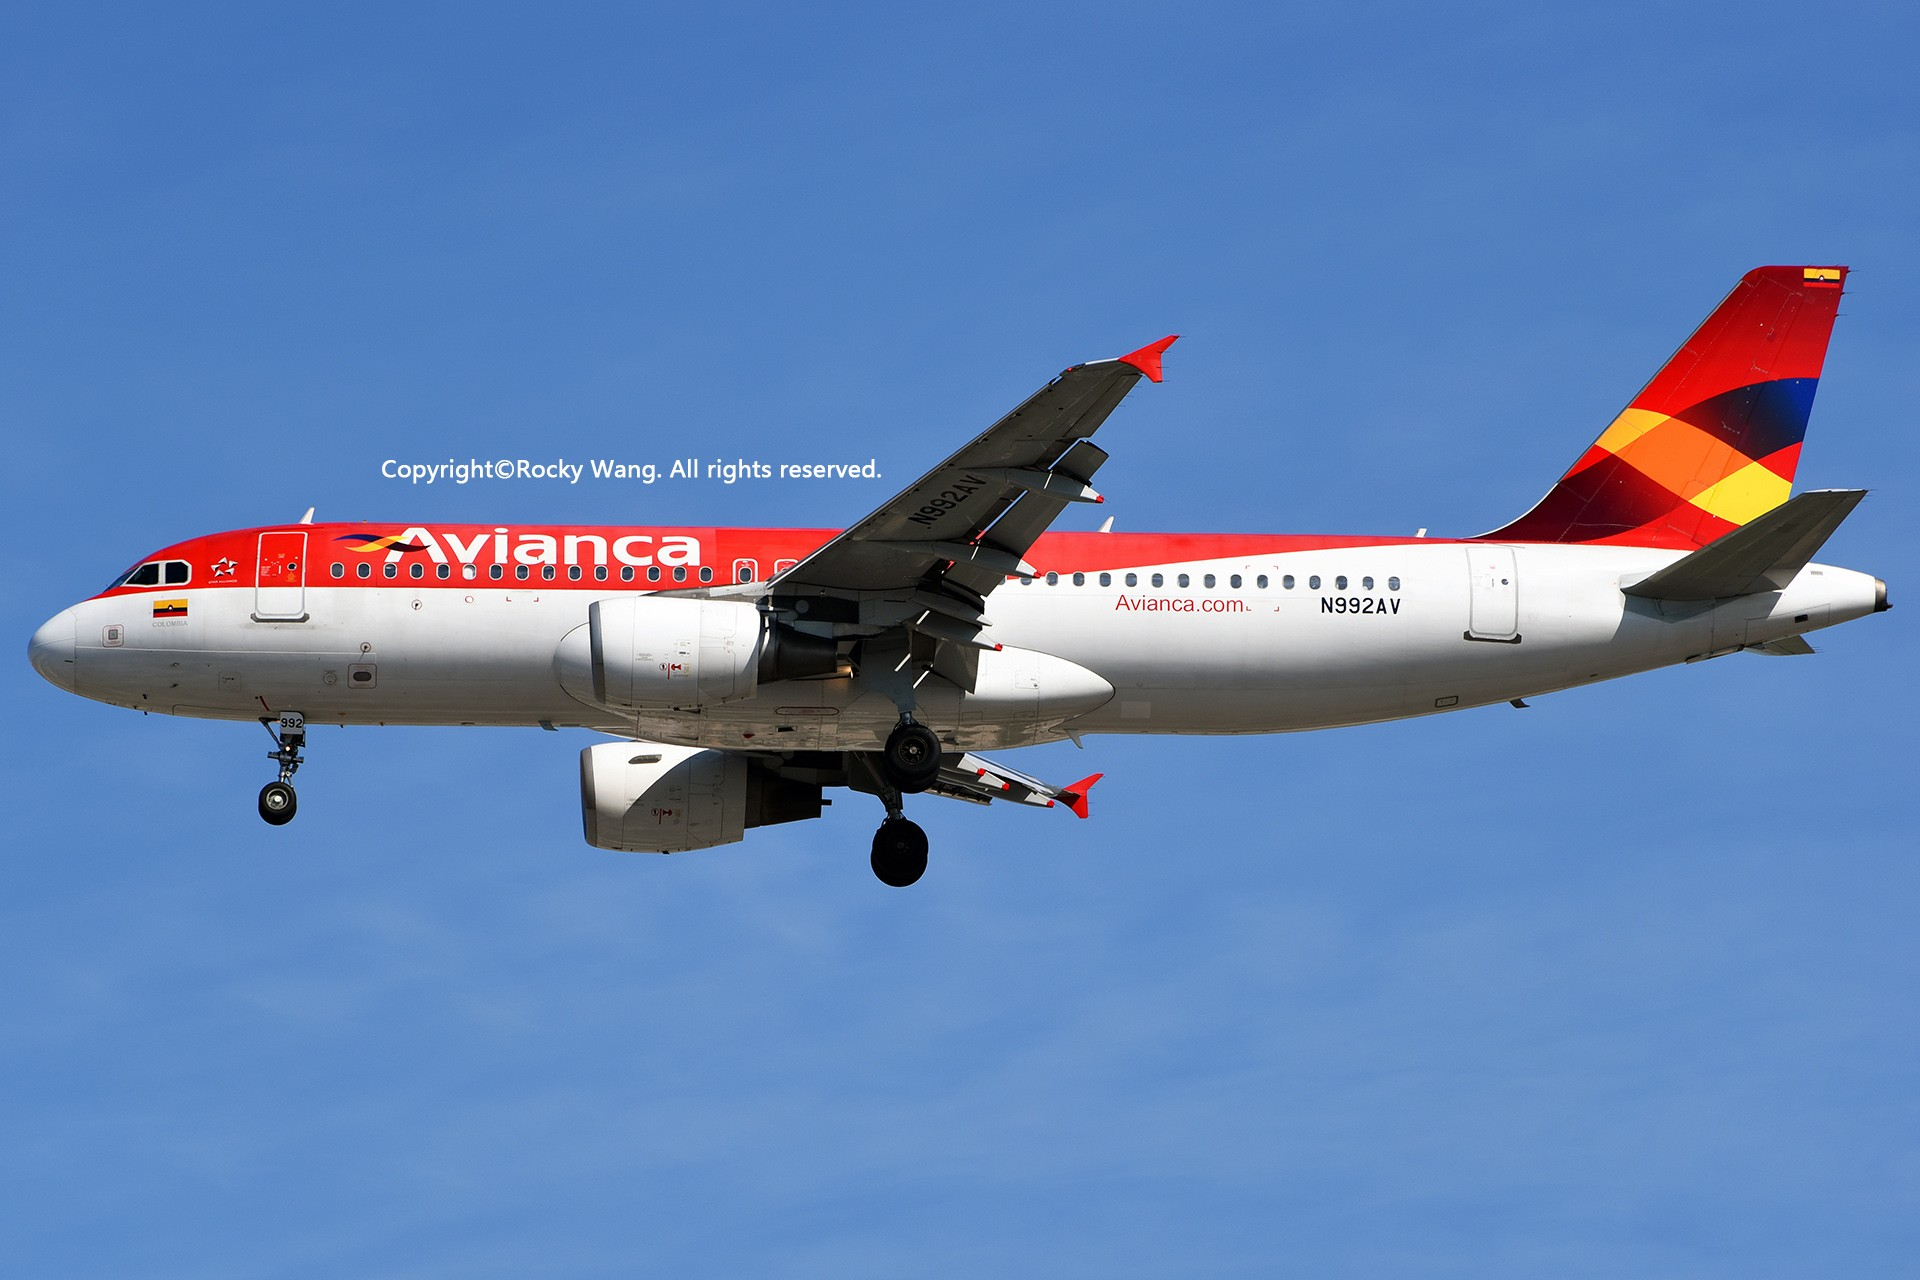 Re:[原创]KMIA 30图 AIRBUS A320-214 N992AV Miami Int'l Airport